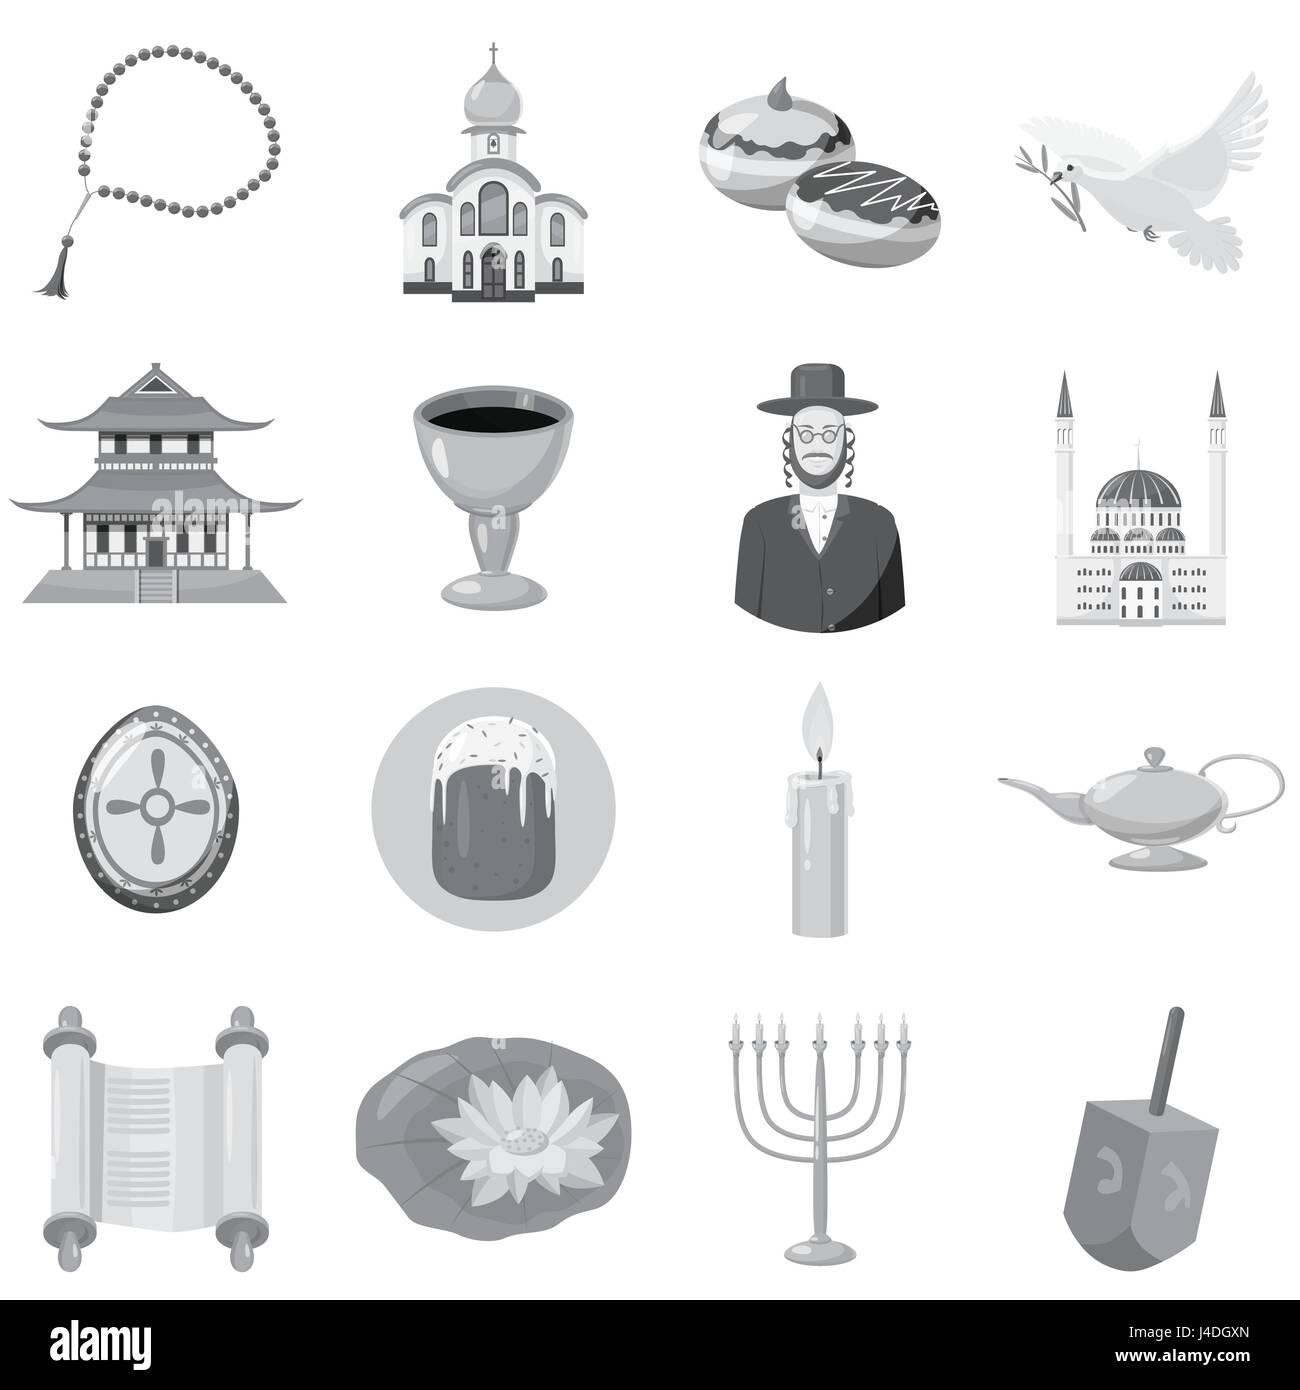 Judaism church traditional symbols icons set - Stock Image